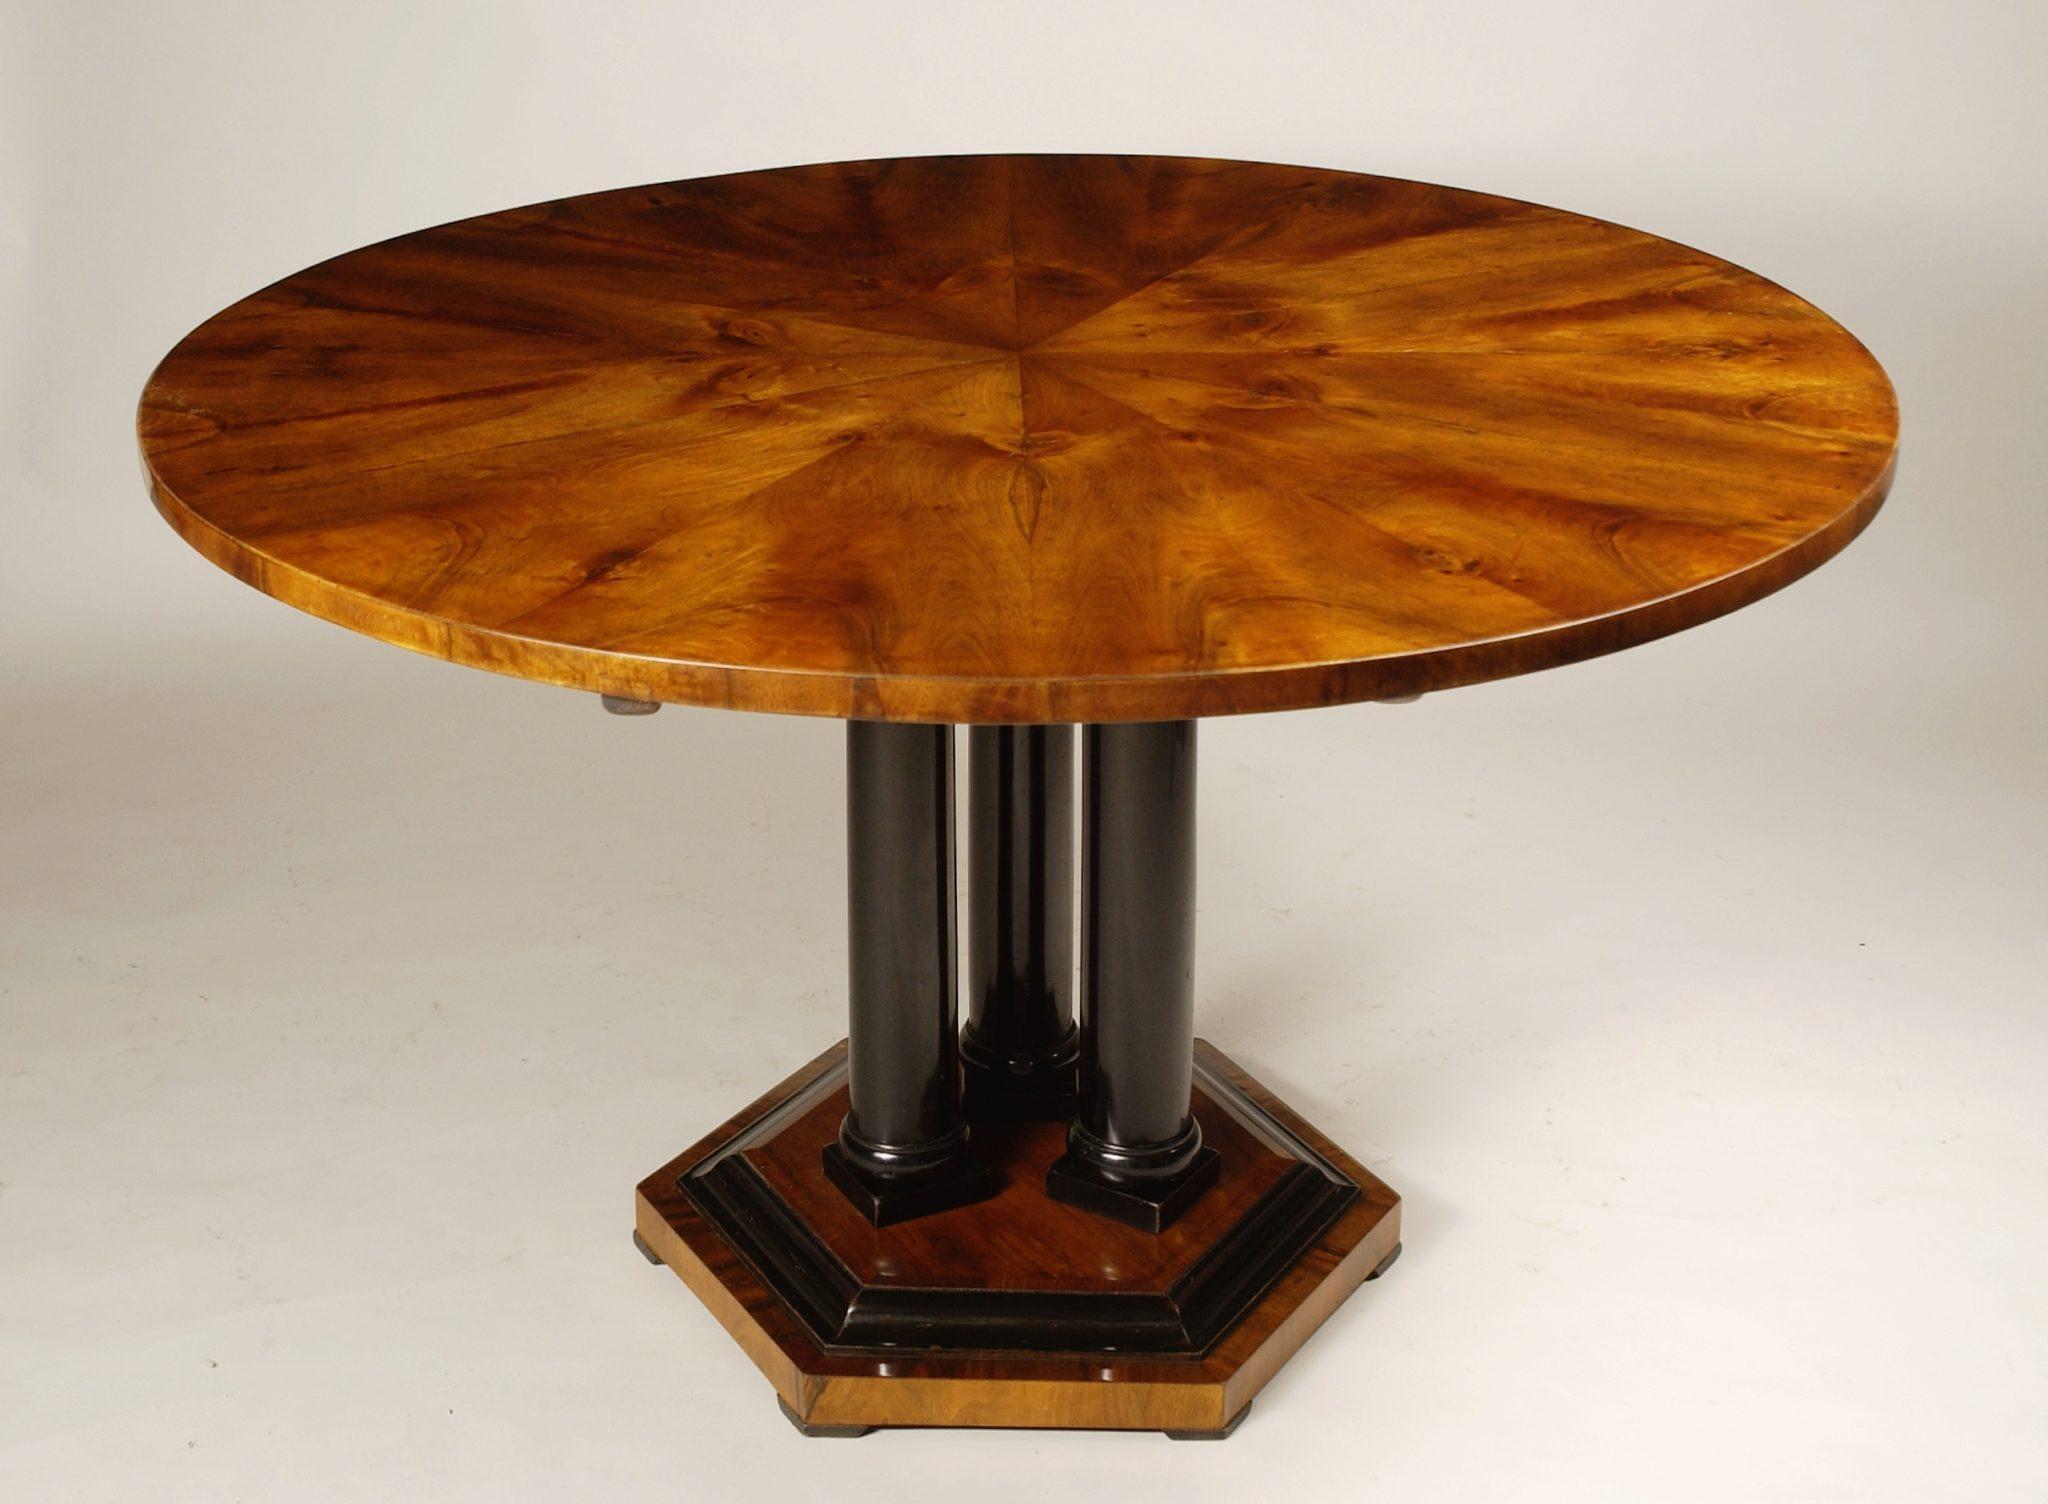 Biedermeier, antique furniture